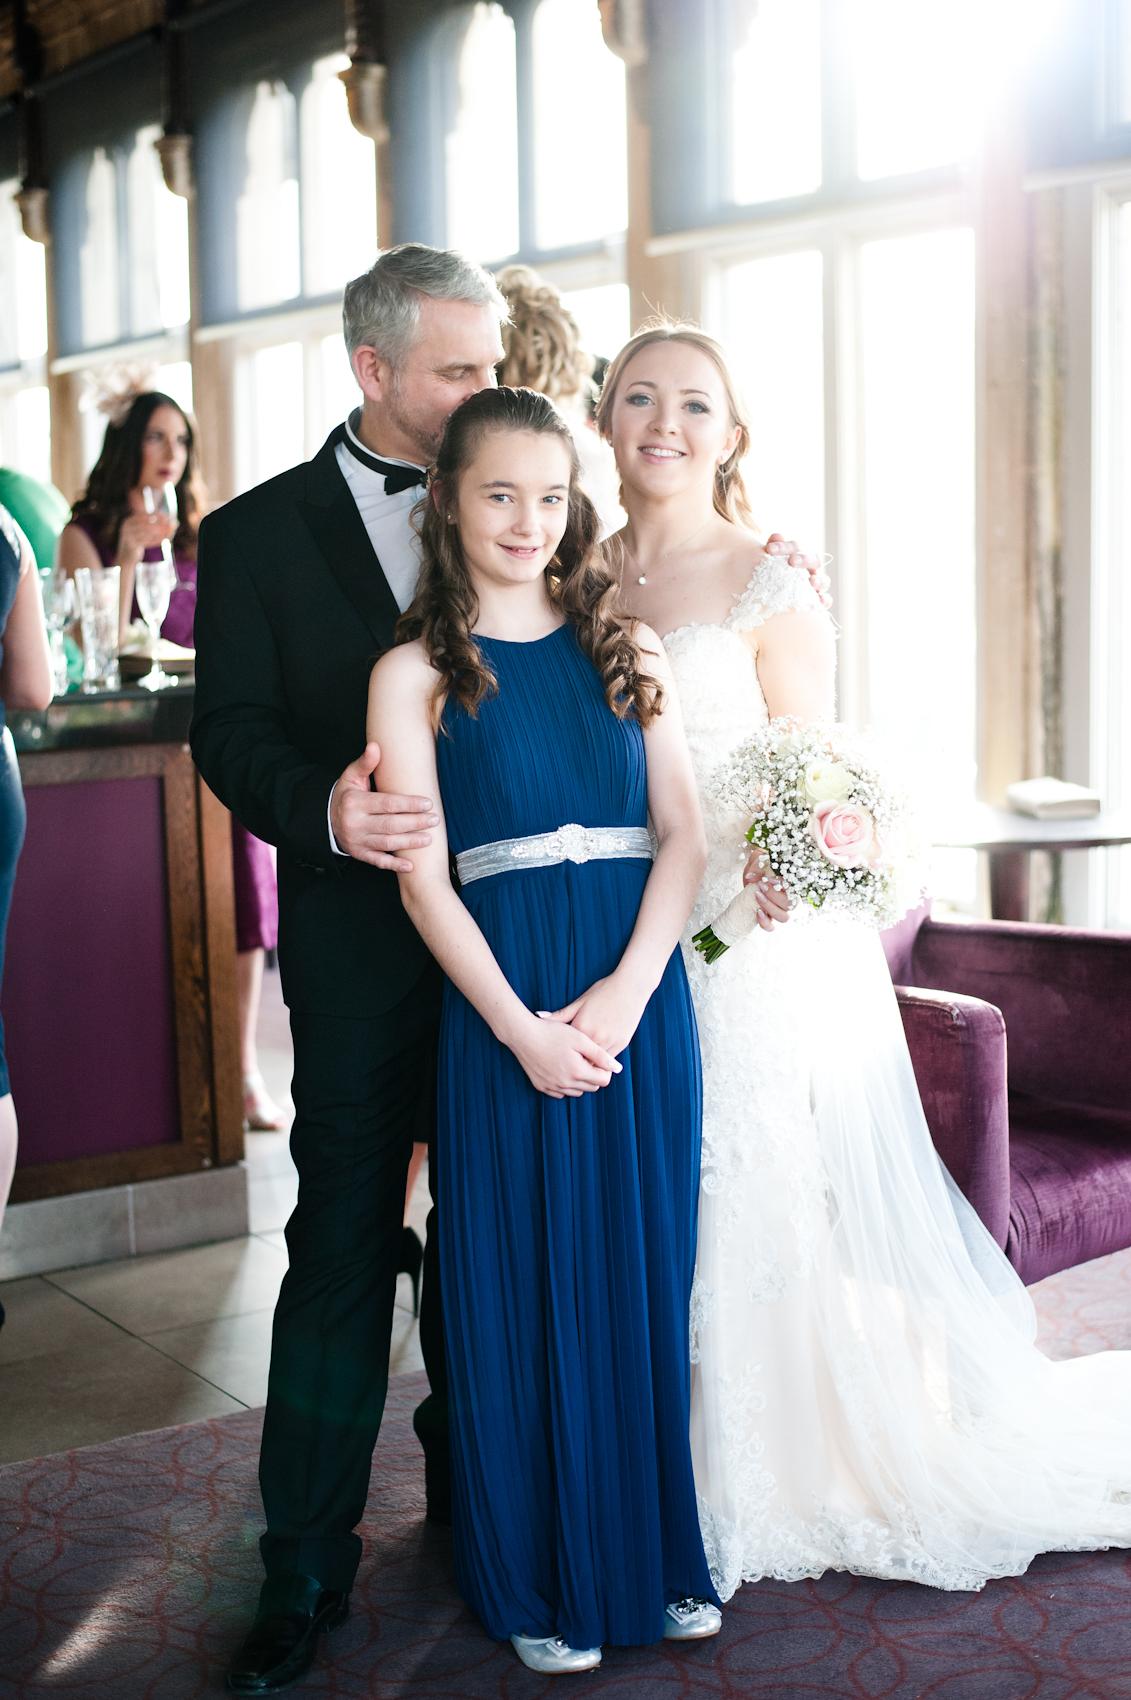 Declan & Emma wedding (17 of 29).jpg